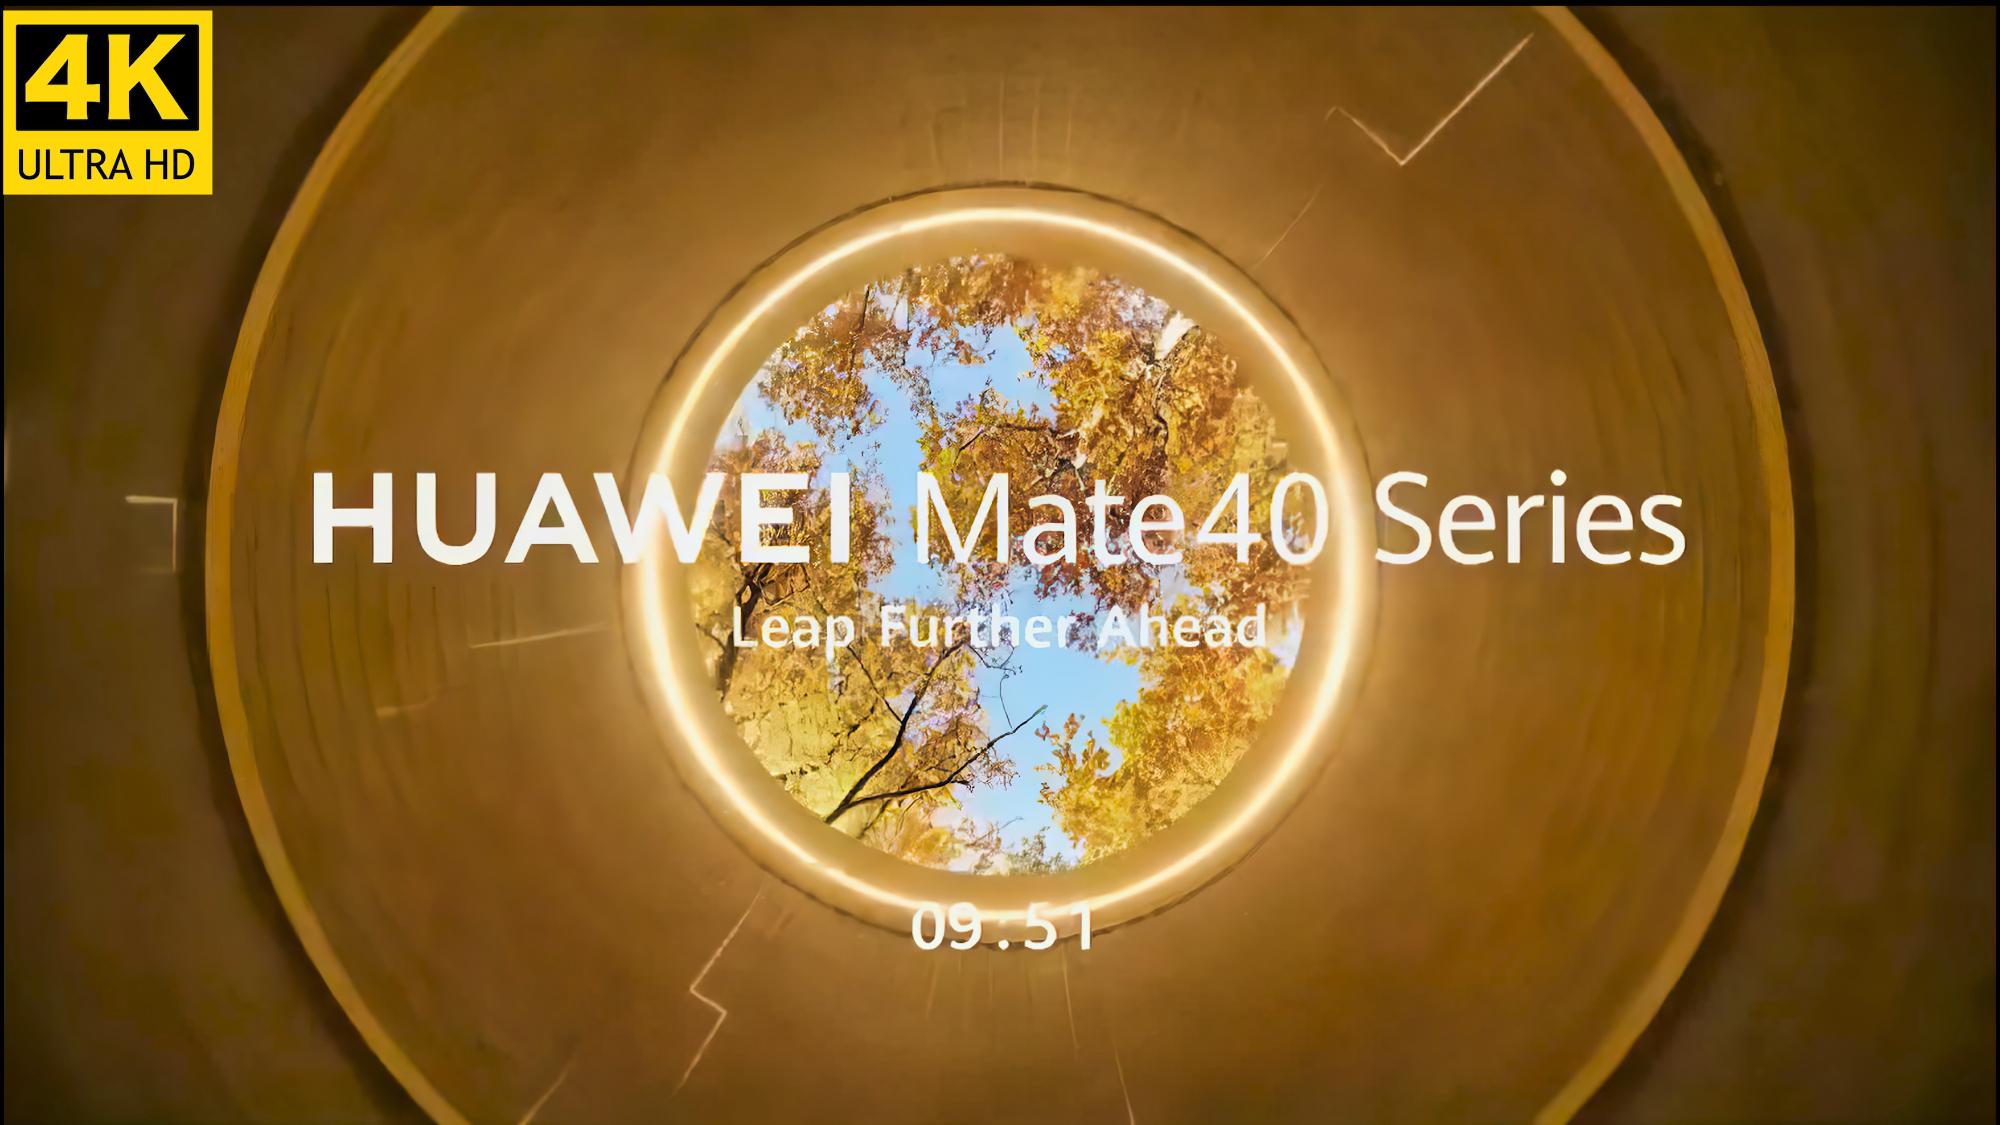 【4k修复60帧】华为 Mate 40 系列 发布会 完整版